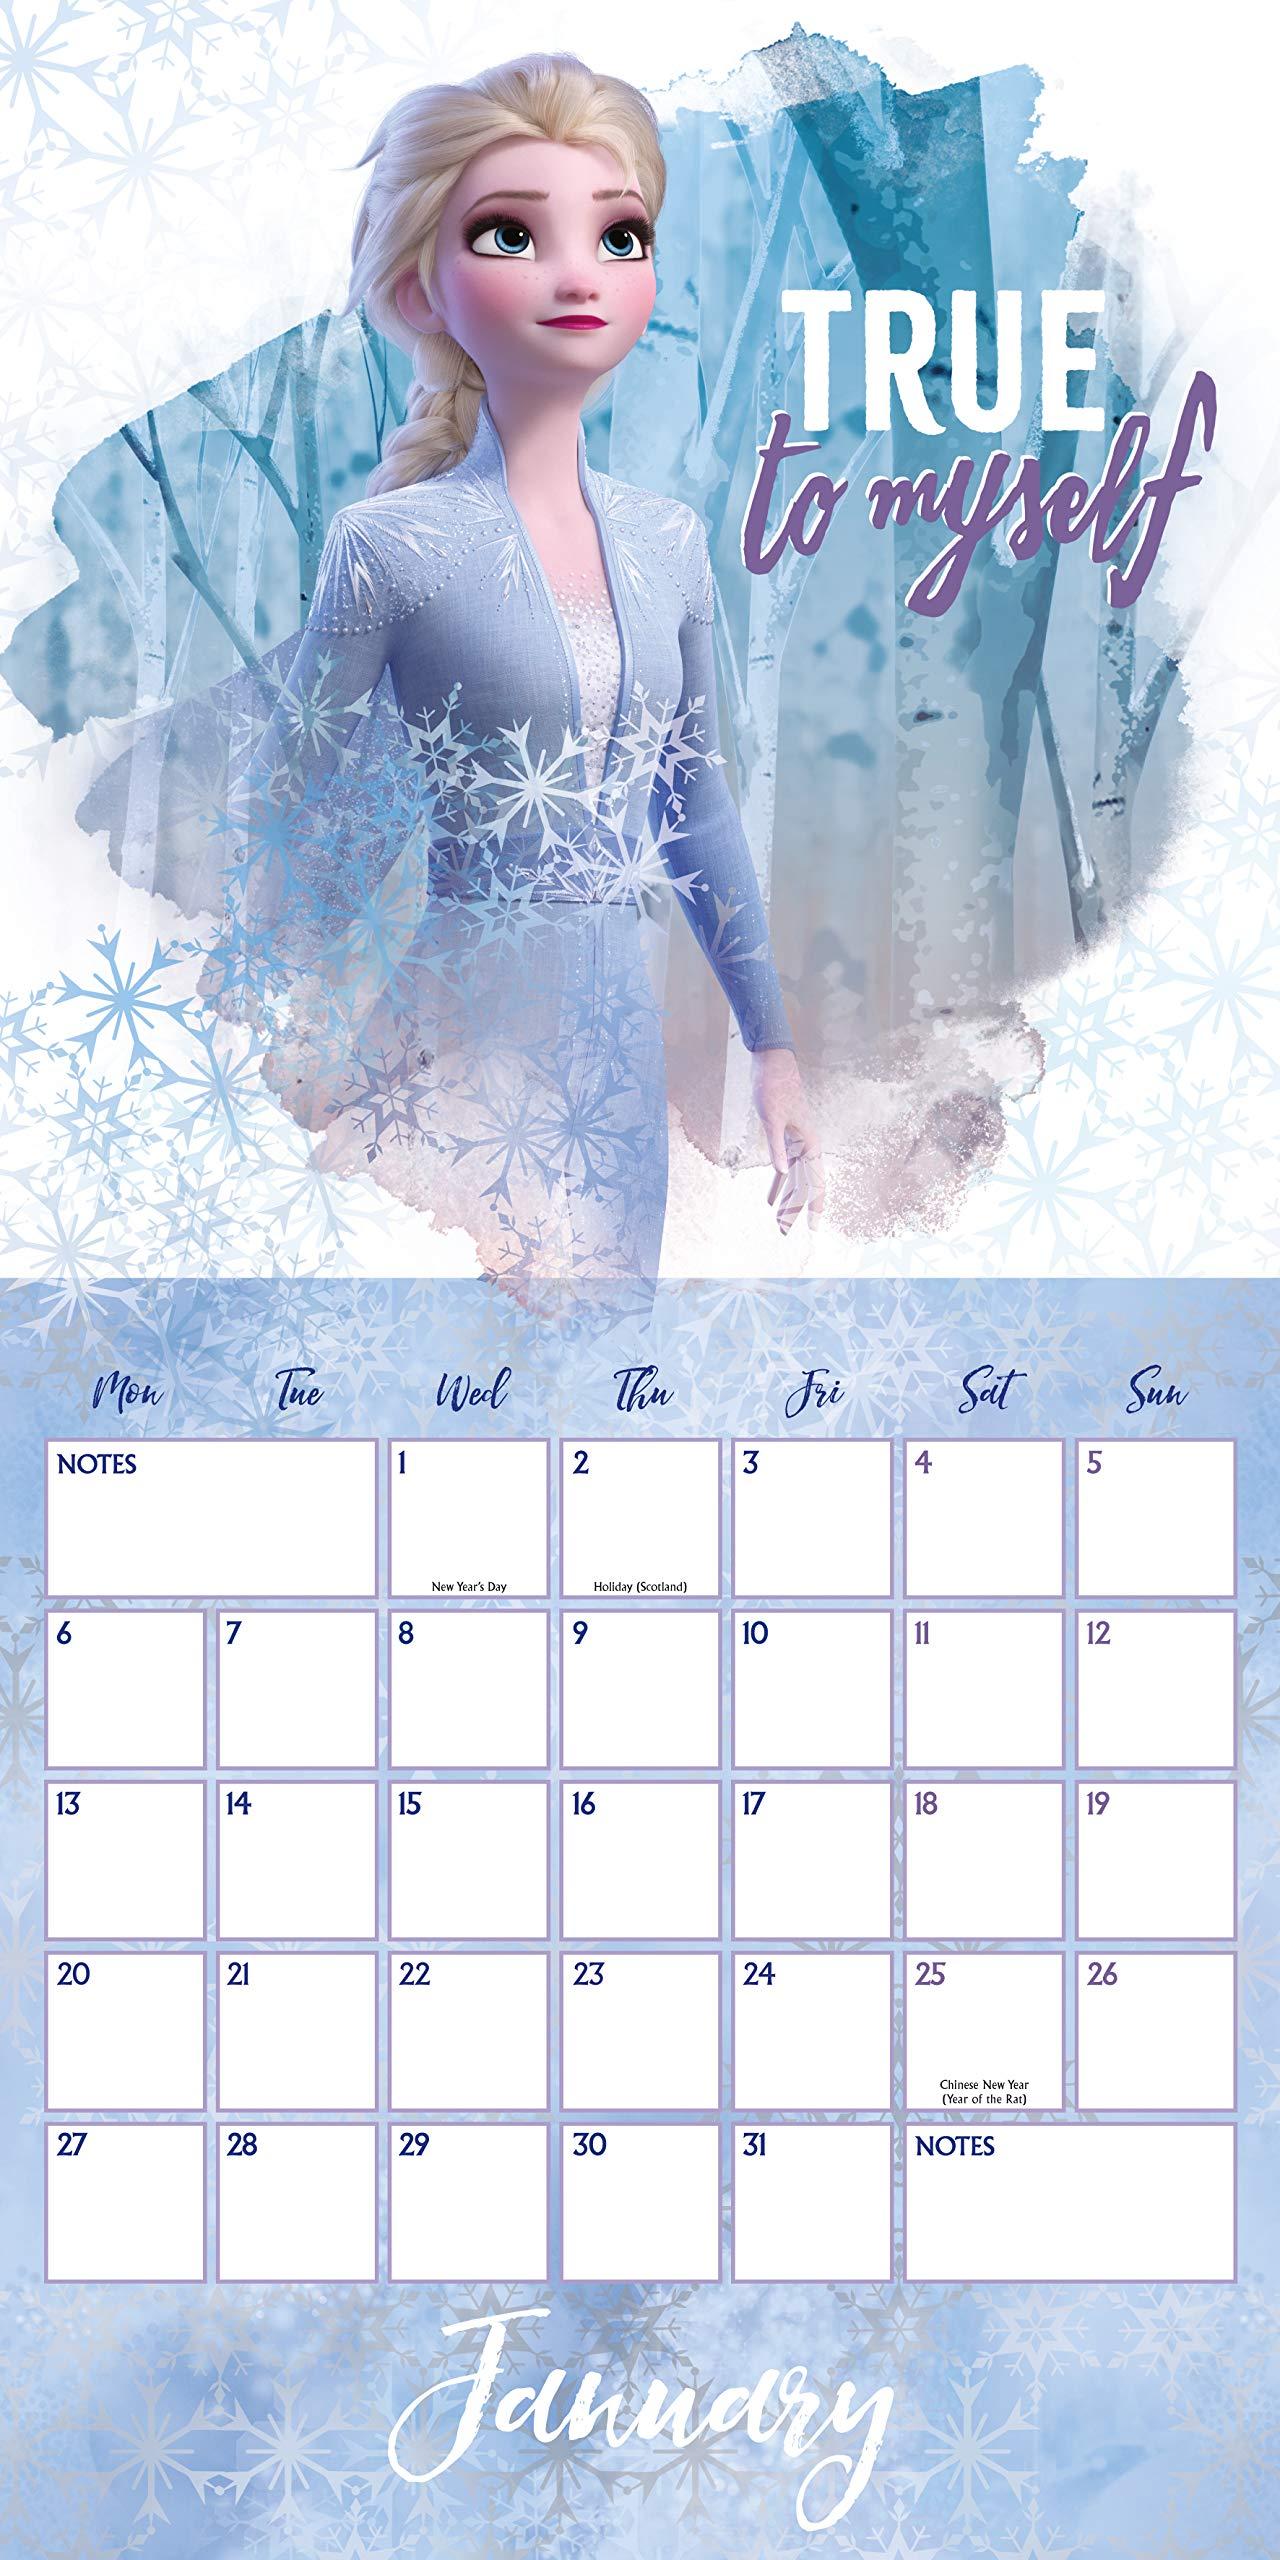 Disney Frozen 2 2020 Calendar - Official Square Wall Format ...